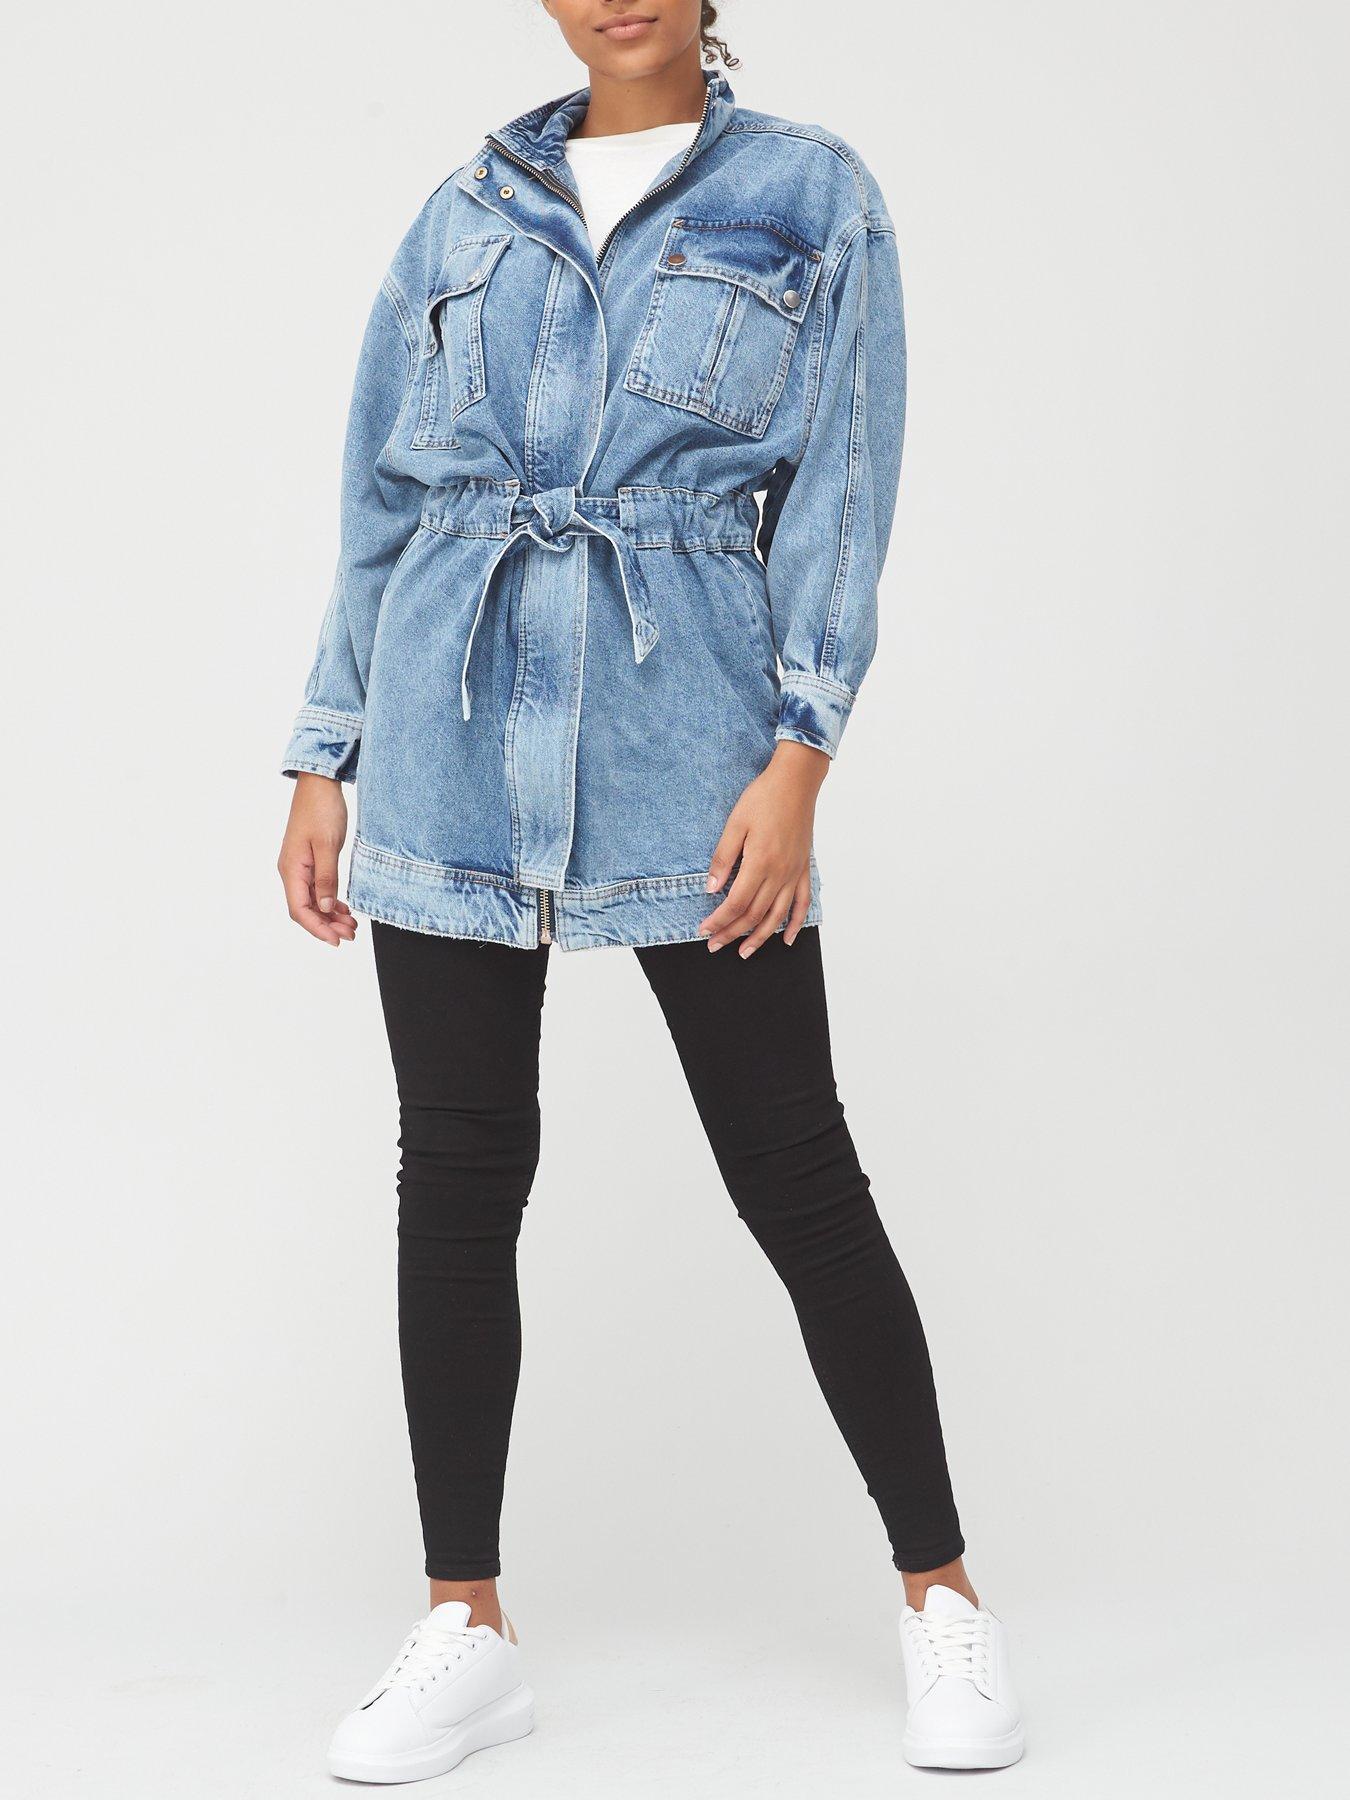 River Island Coats & Jackets | Womenswear | very.co.uk